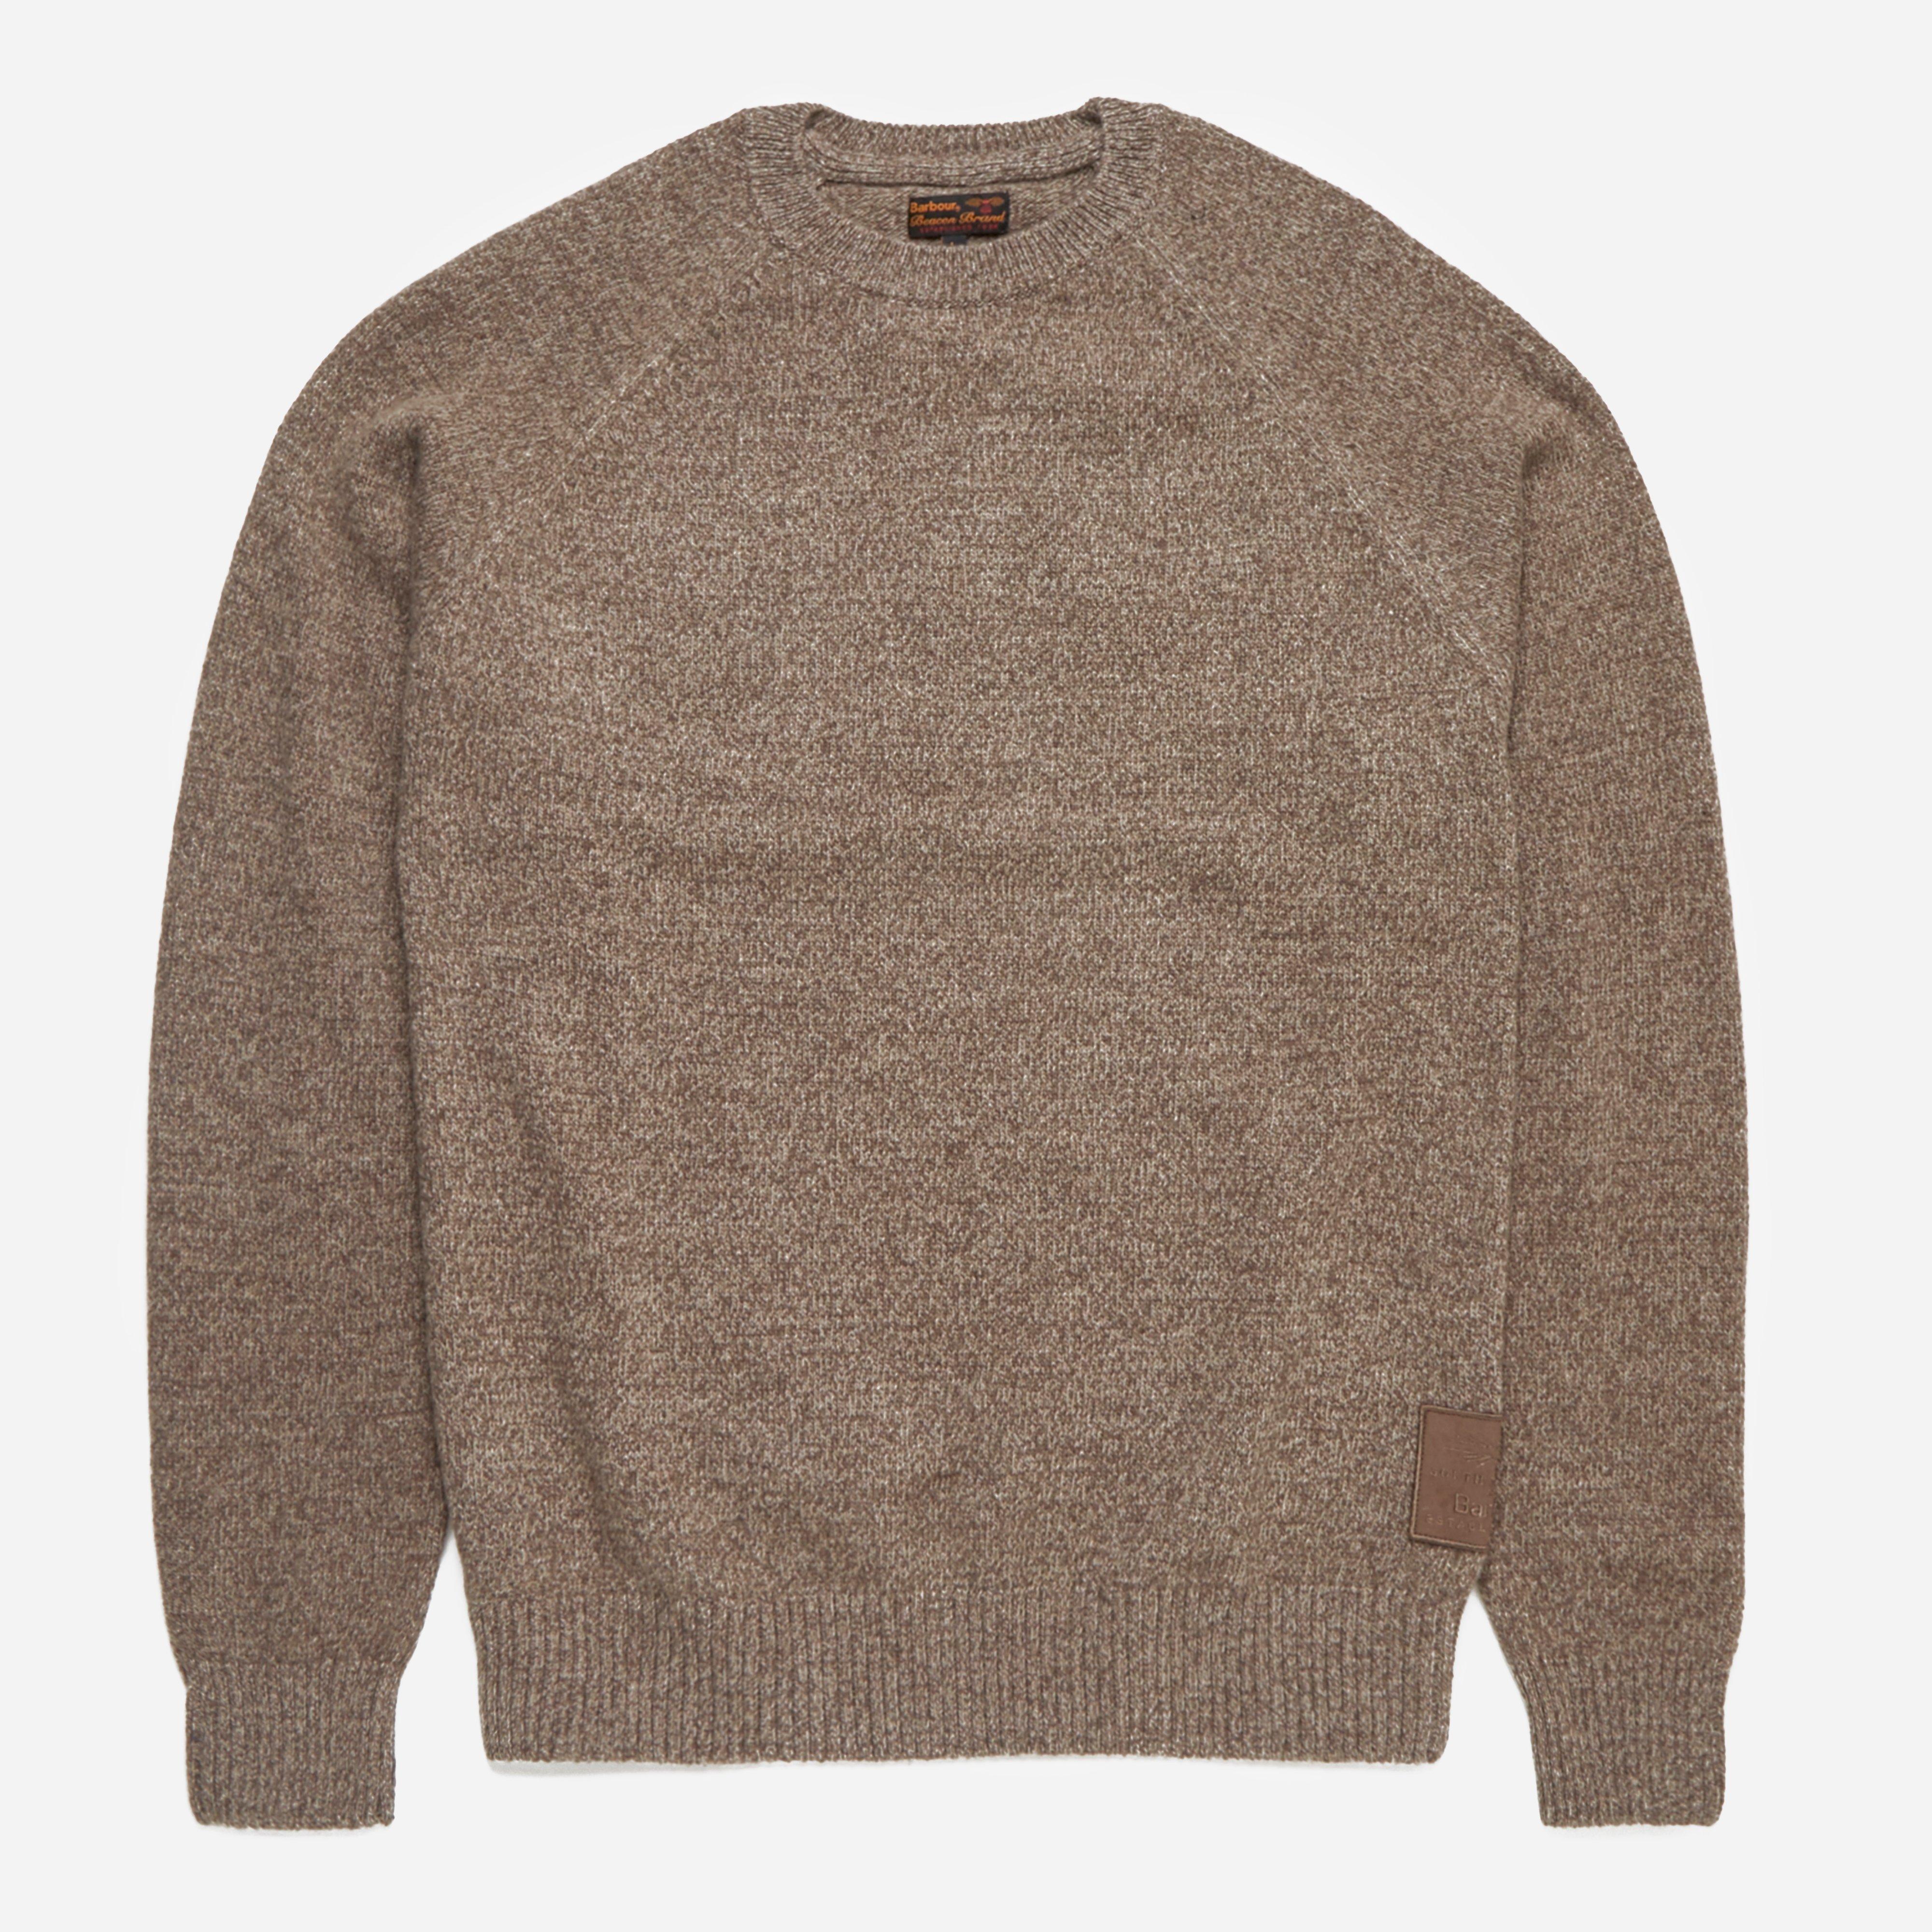 Barbour Staple Crew Knit